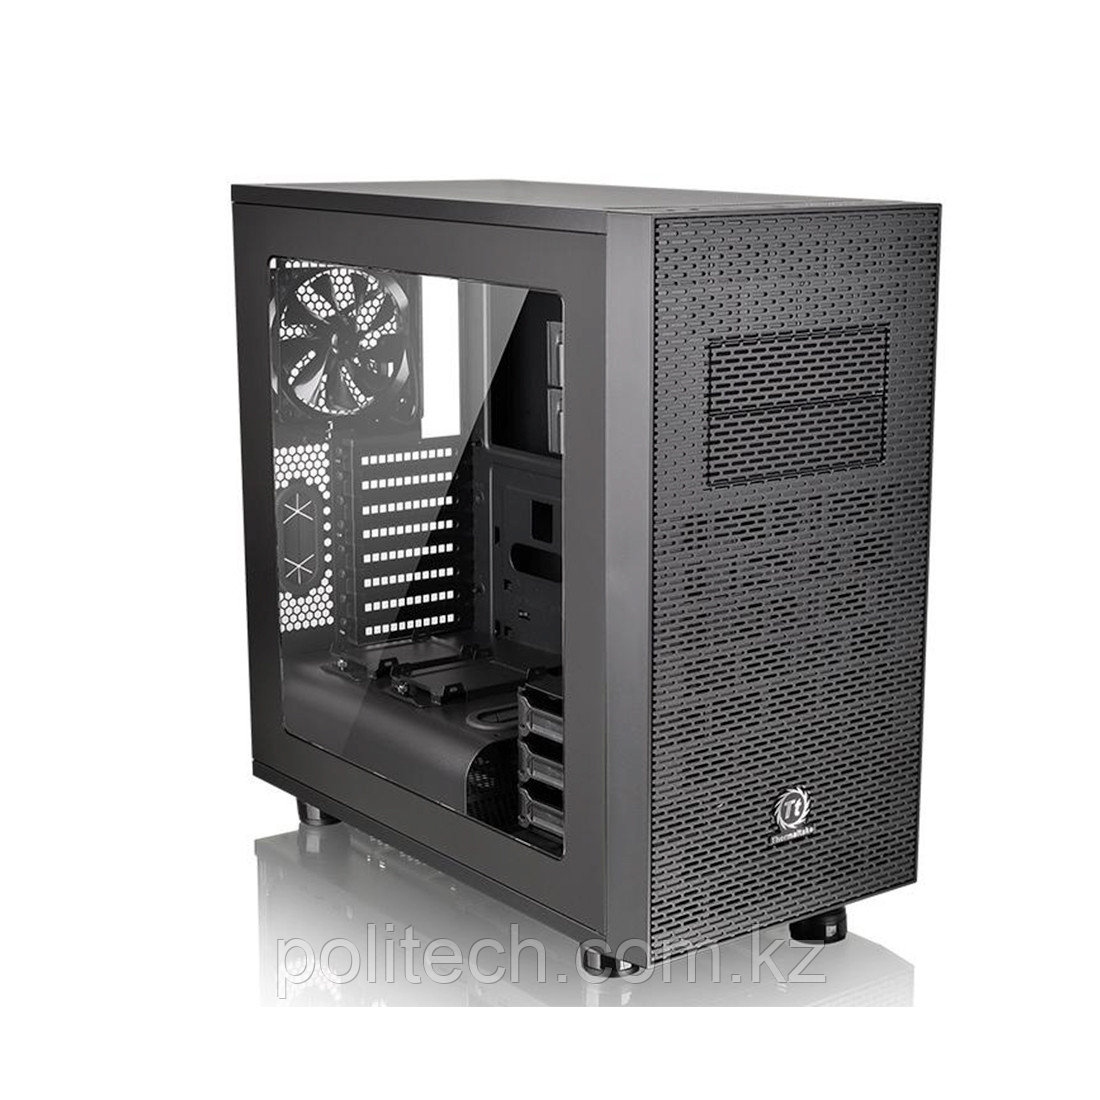 Компьютерный корпус Thermaltake Core X31 без Б/П